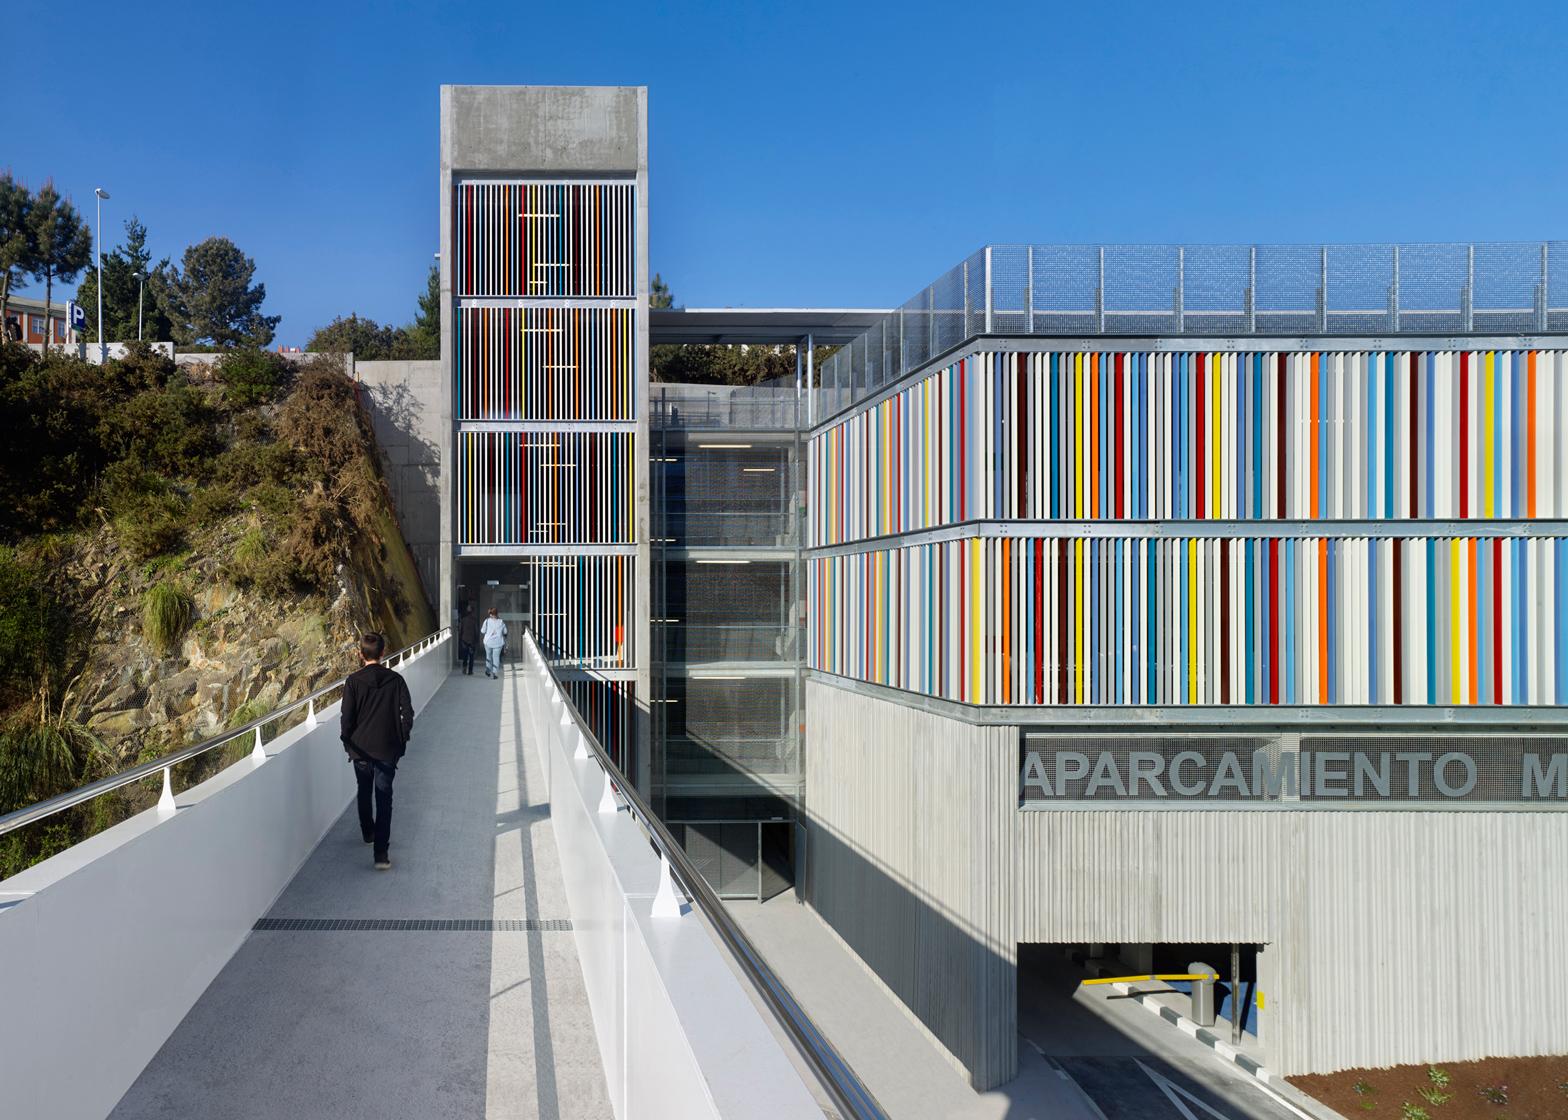 Maternity and Oncologic parking by Díaz & Díaz Arquitectos